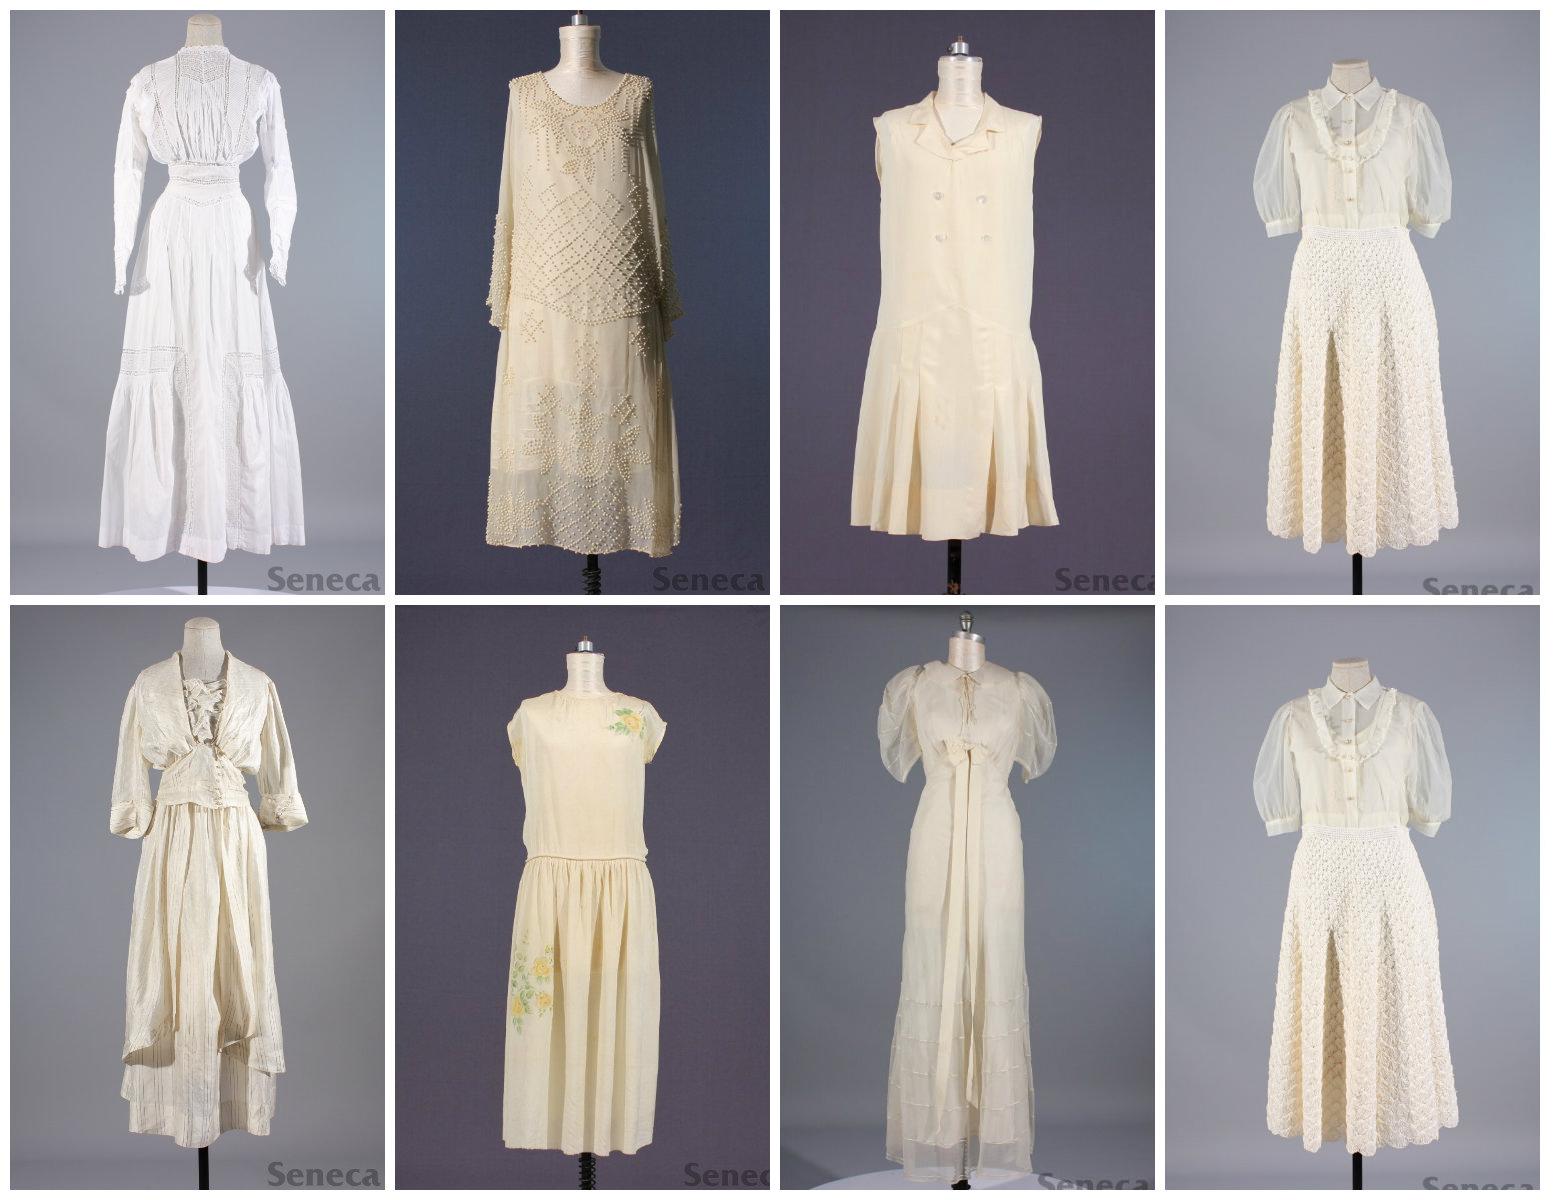 Dresses from Seneca Fashion Resource Centre